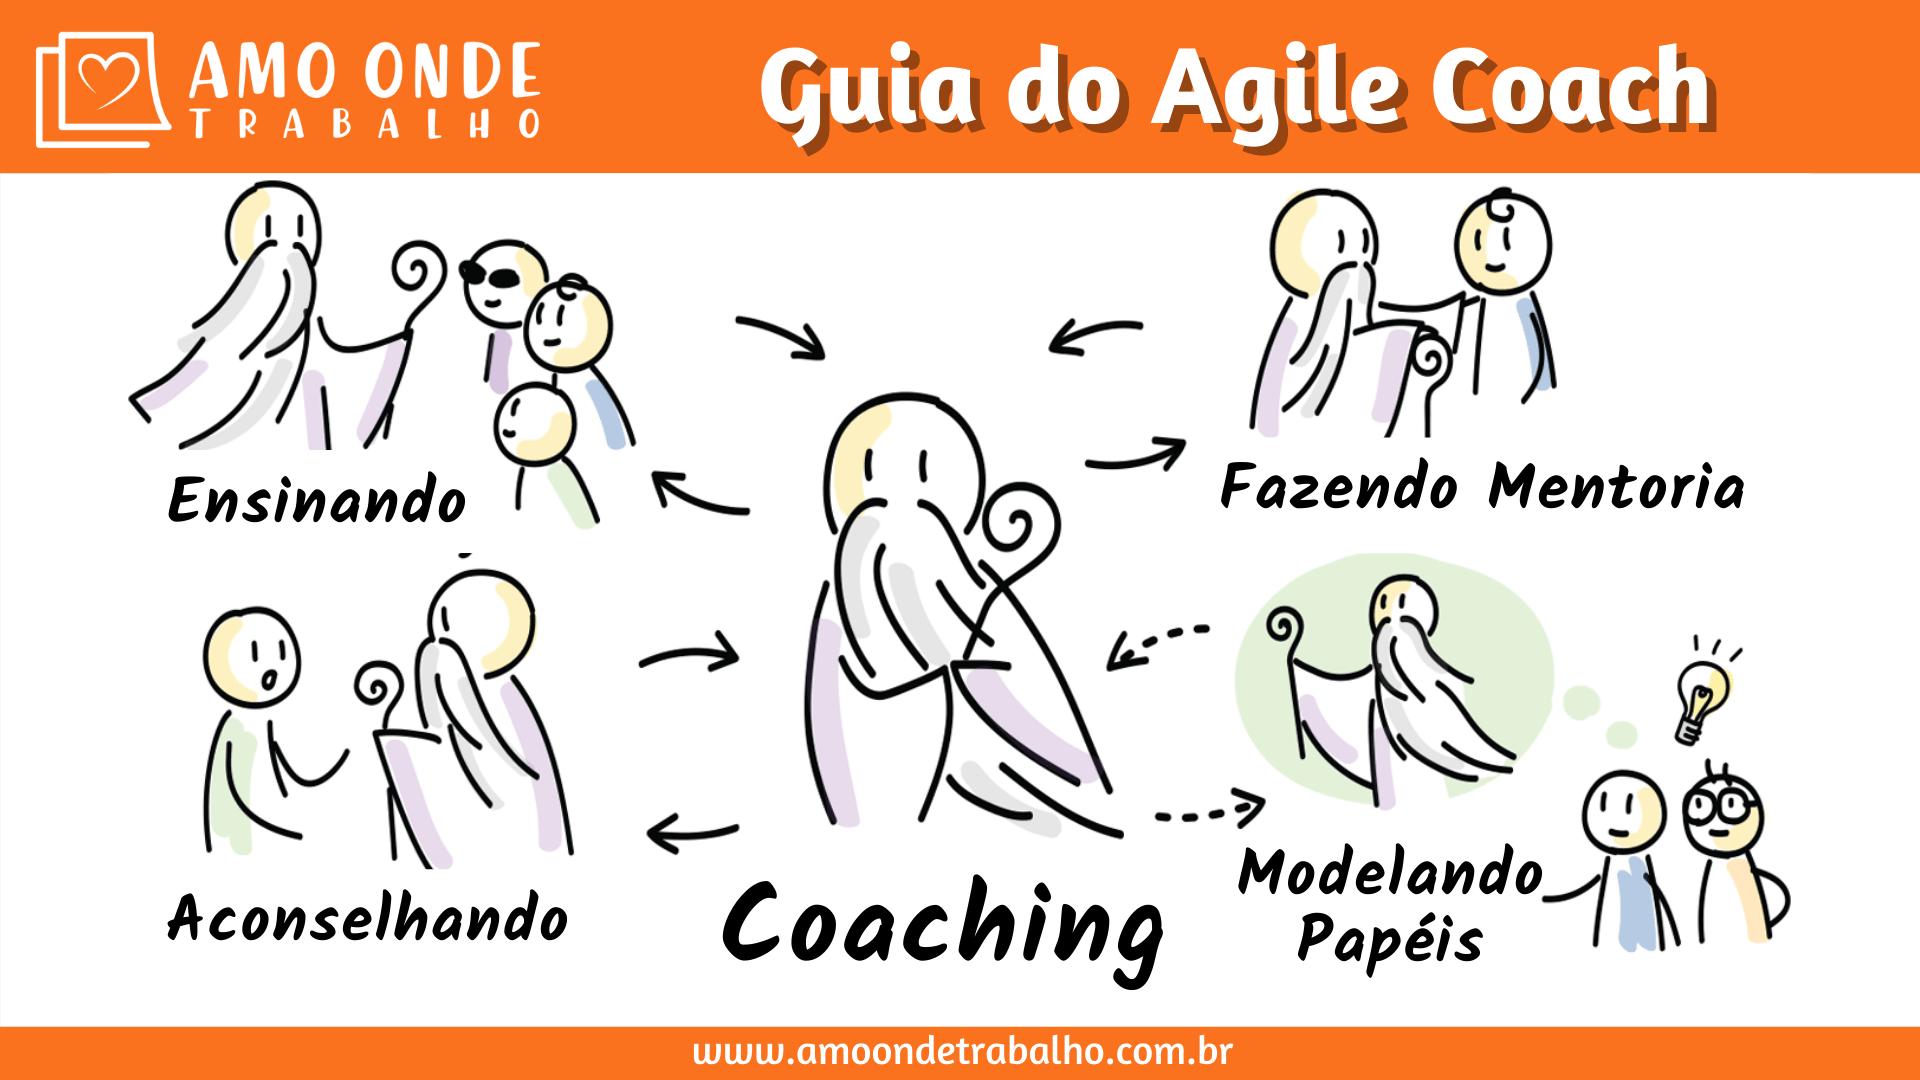 Guia do Agile Coach - Posturas